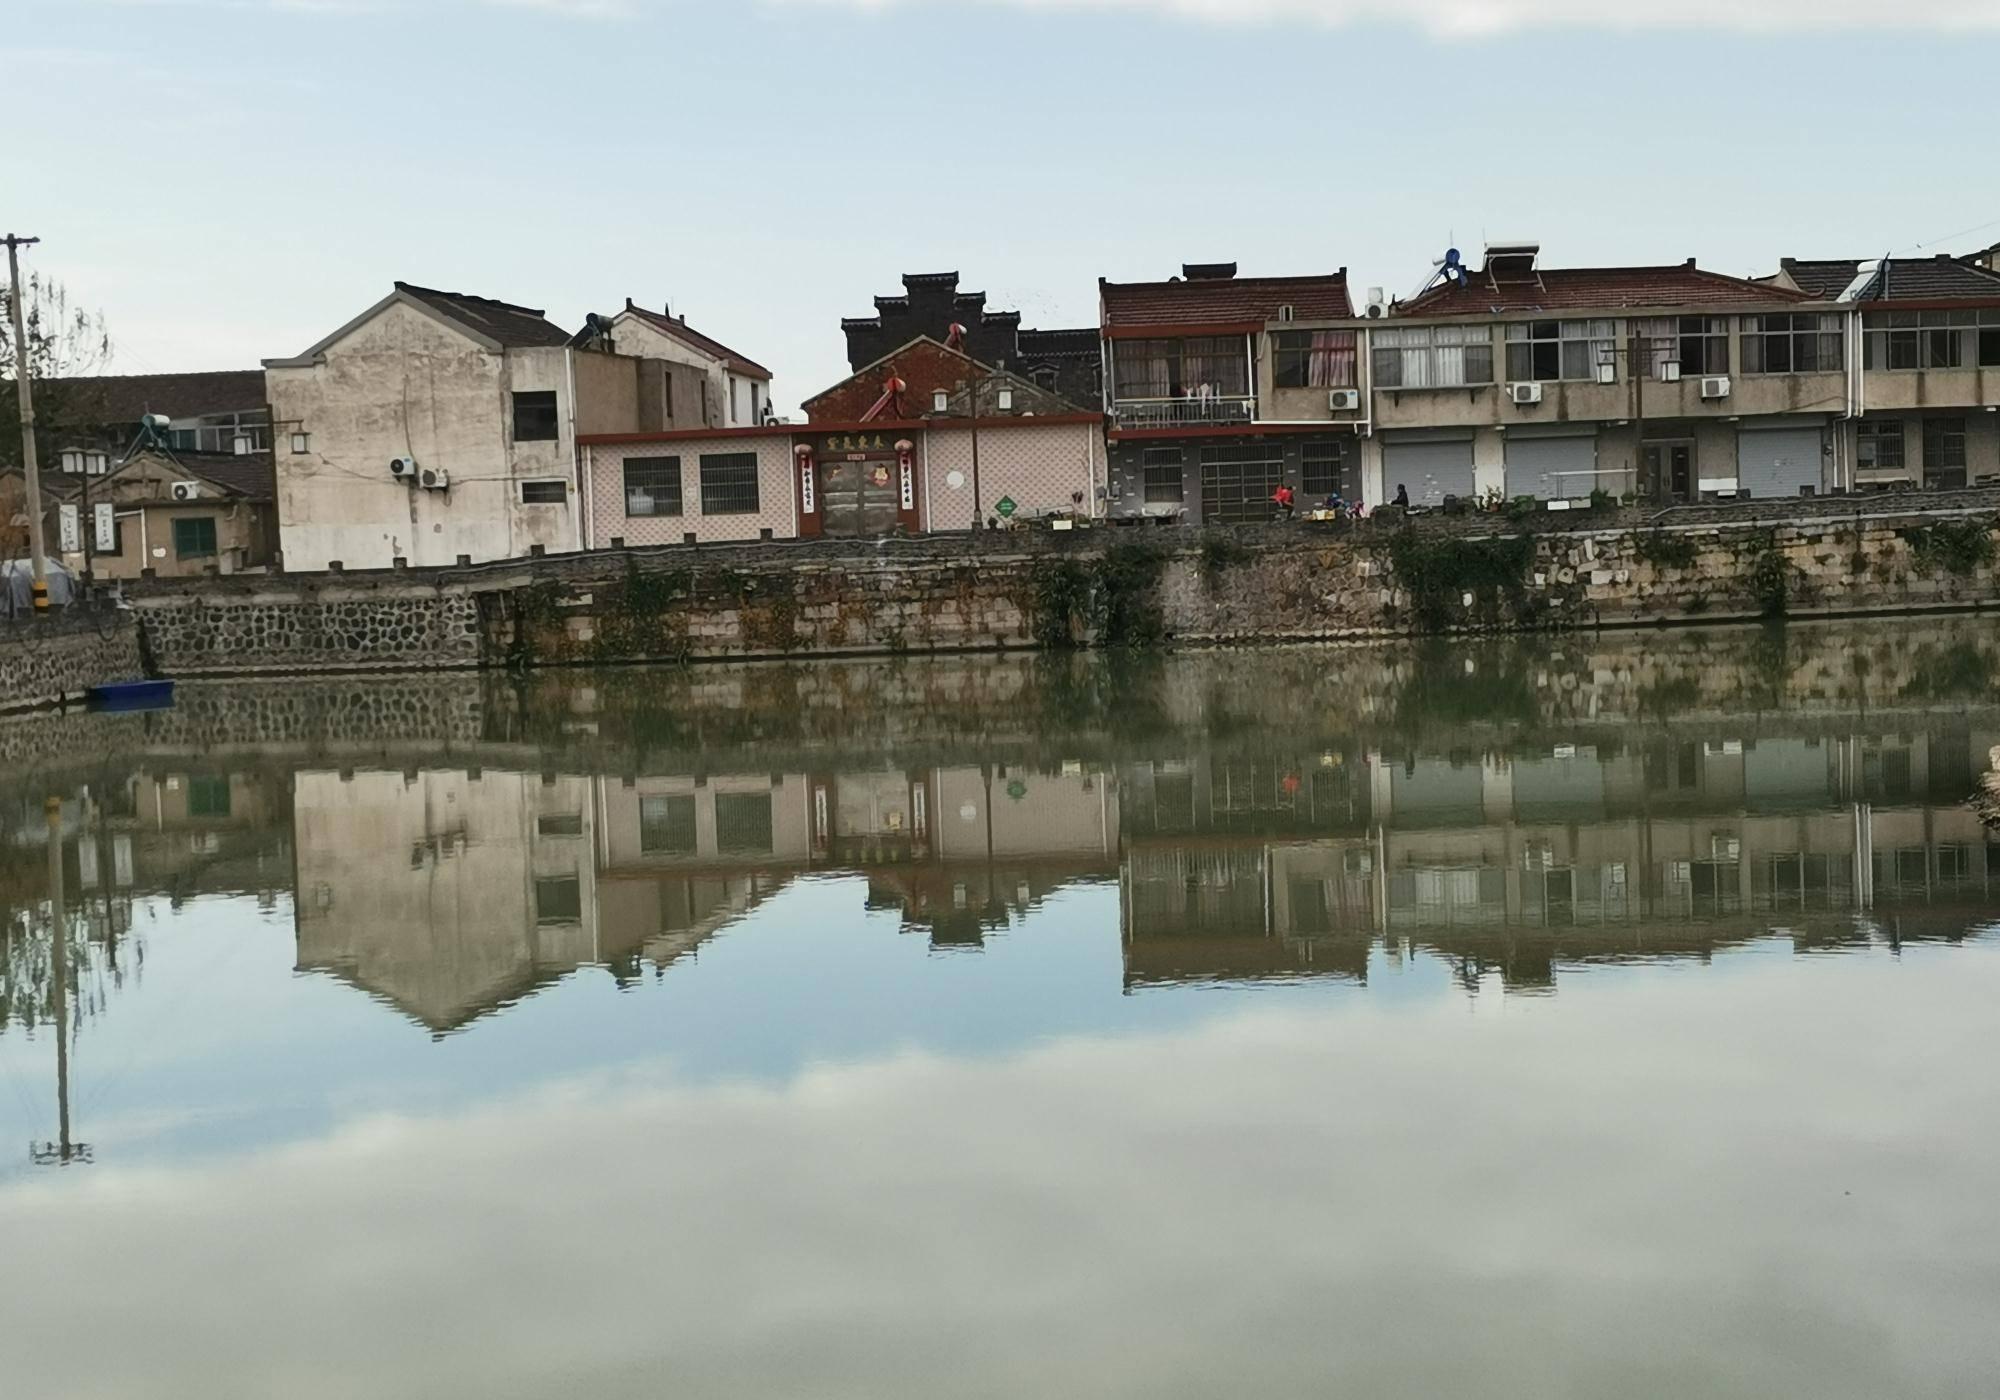 <strong>扬州古镇 曾经繁荣昌盛 有2000年的历史</strong>